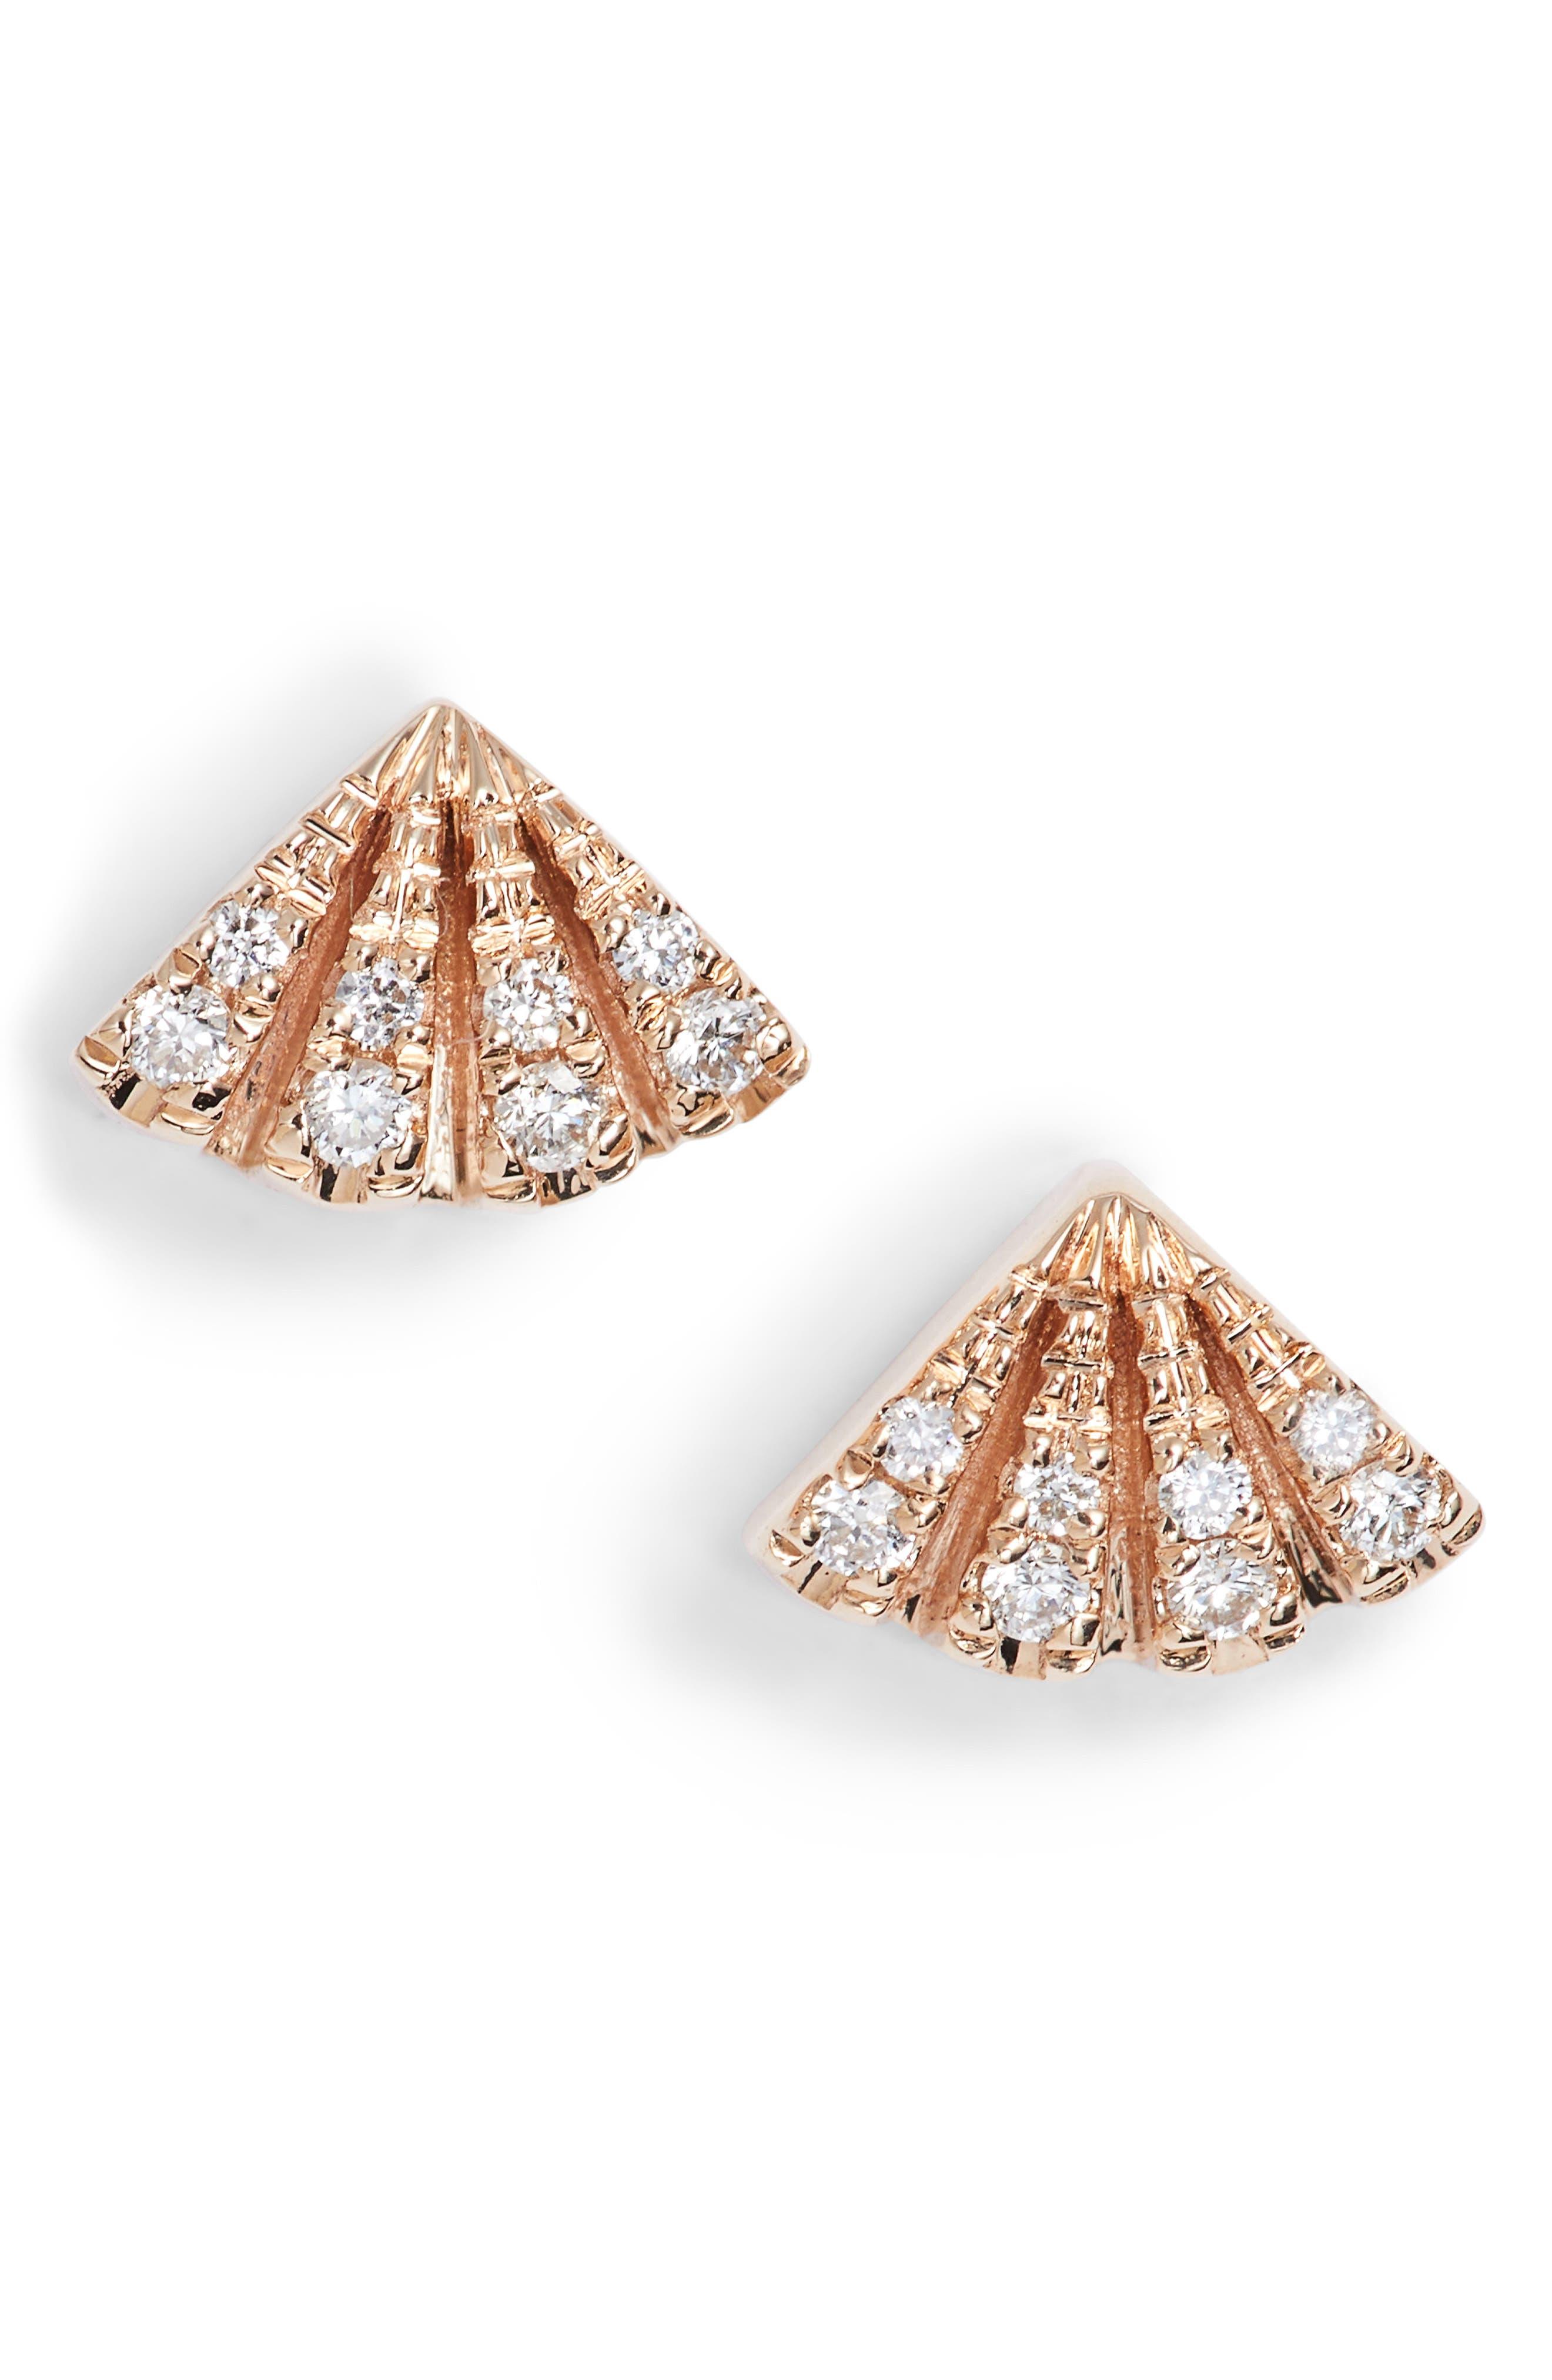 Dana Rebecca Isla Rio Diamond Fan Stud Earrings,                             Main thumbnail 1, color,                             Rose Gold